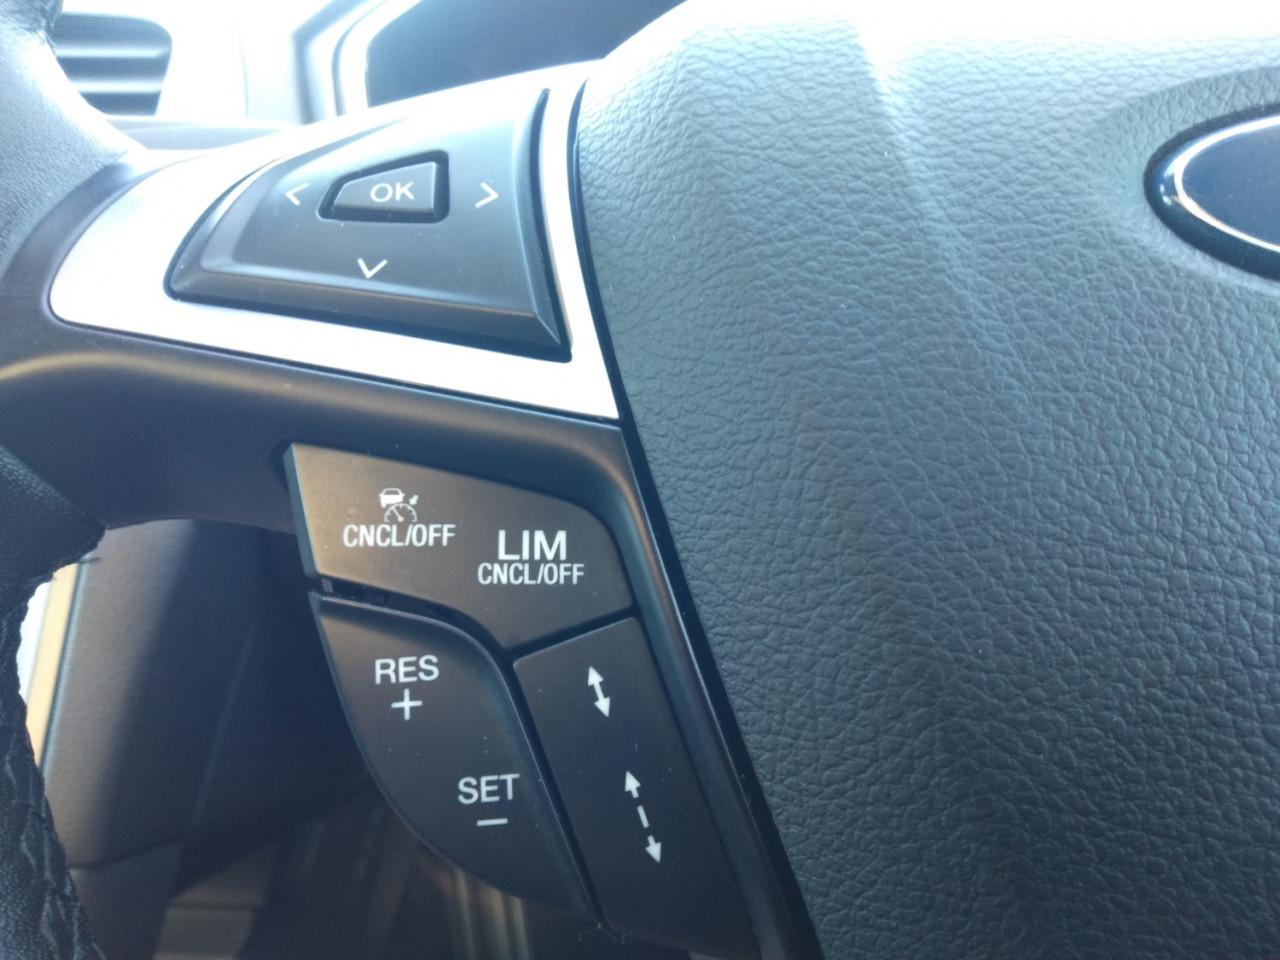 2016 Ford Mondeo MD TITANIUM Hatchback Image 16